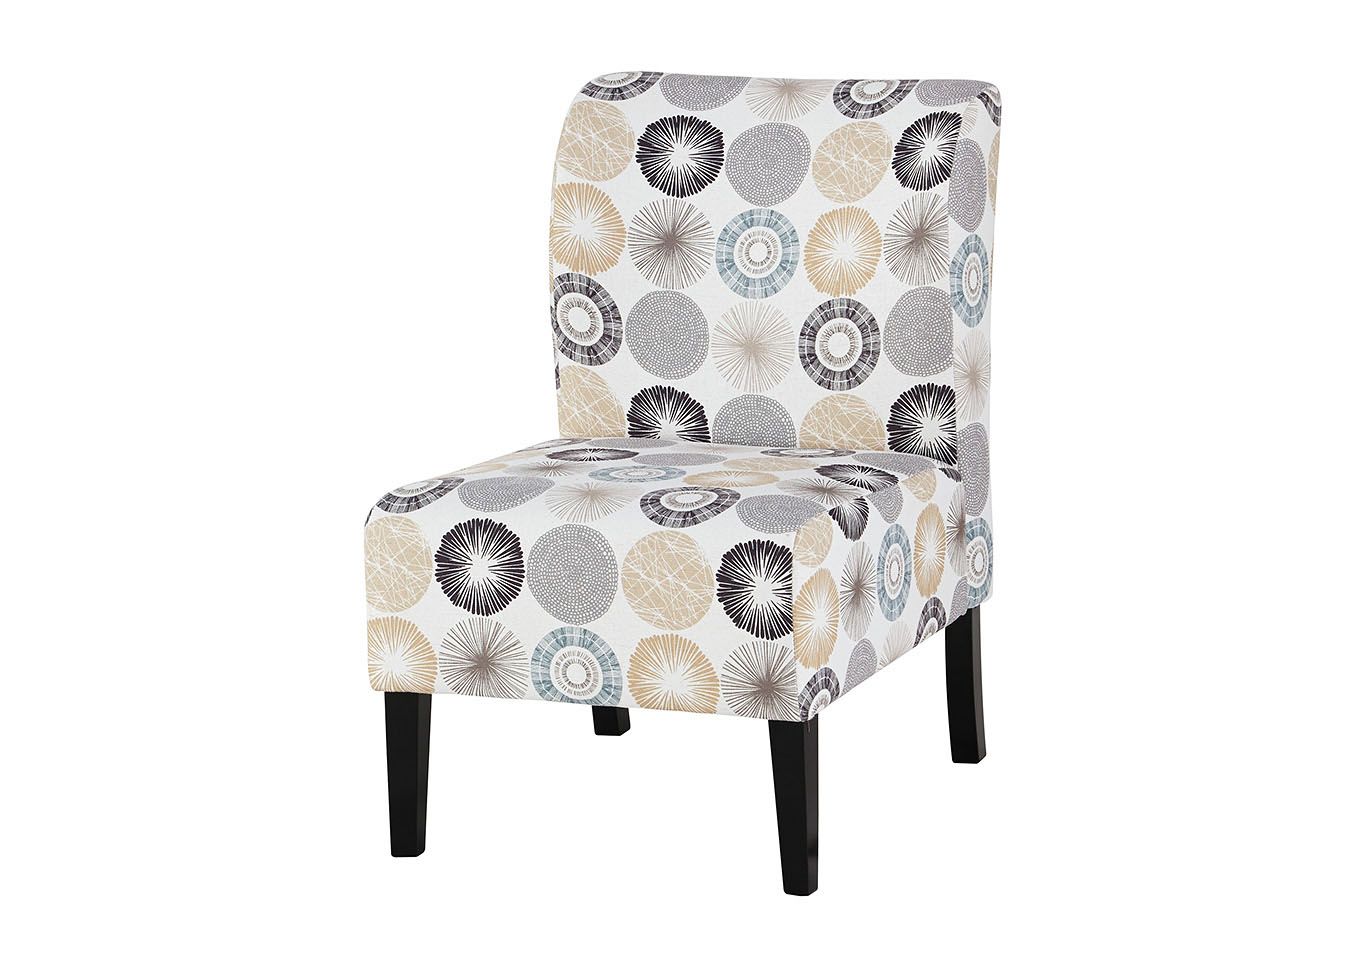 Triptis Gray/Tan Accent Chair,48 Hour Quick Ship